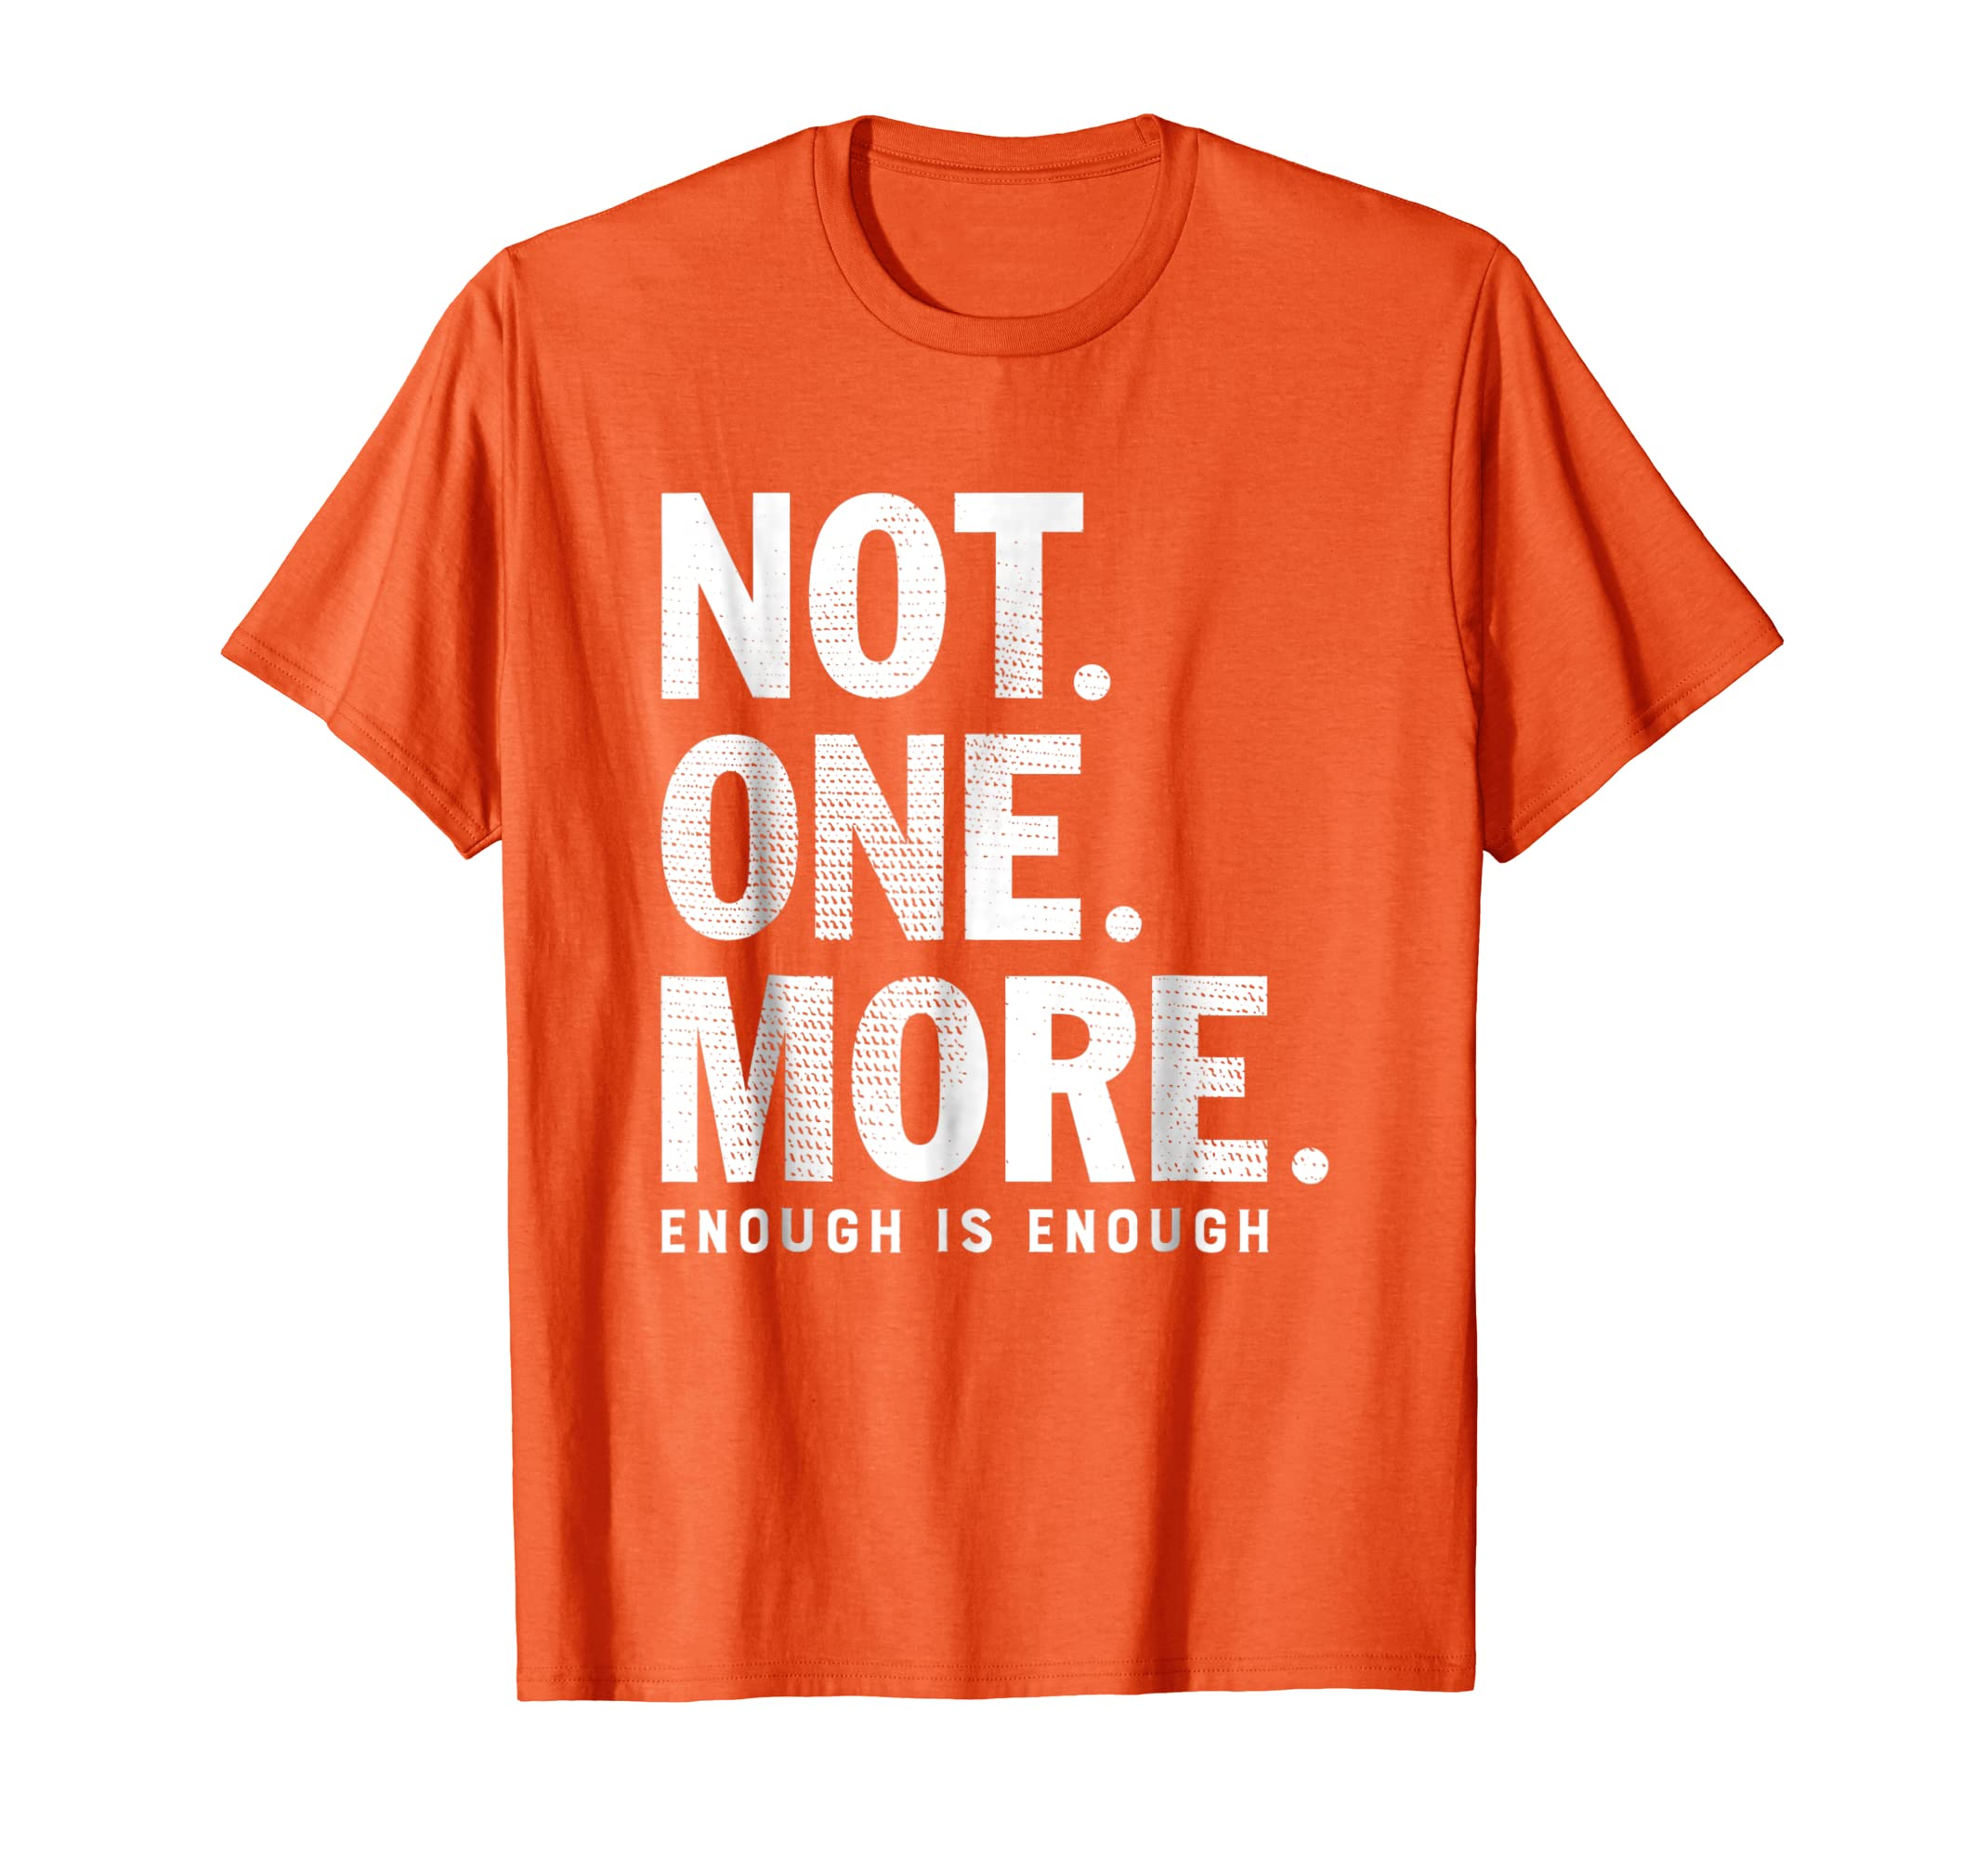 Not. One. More. Enough - Orange Gun Violence Awareness Shirt-alottee gift